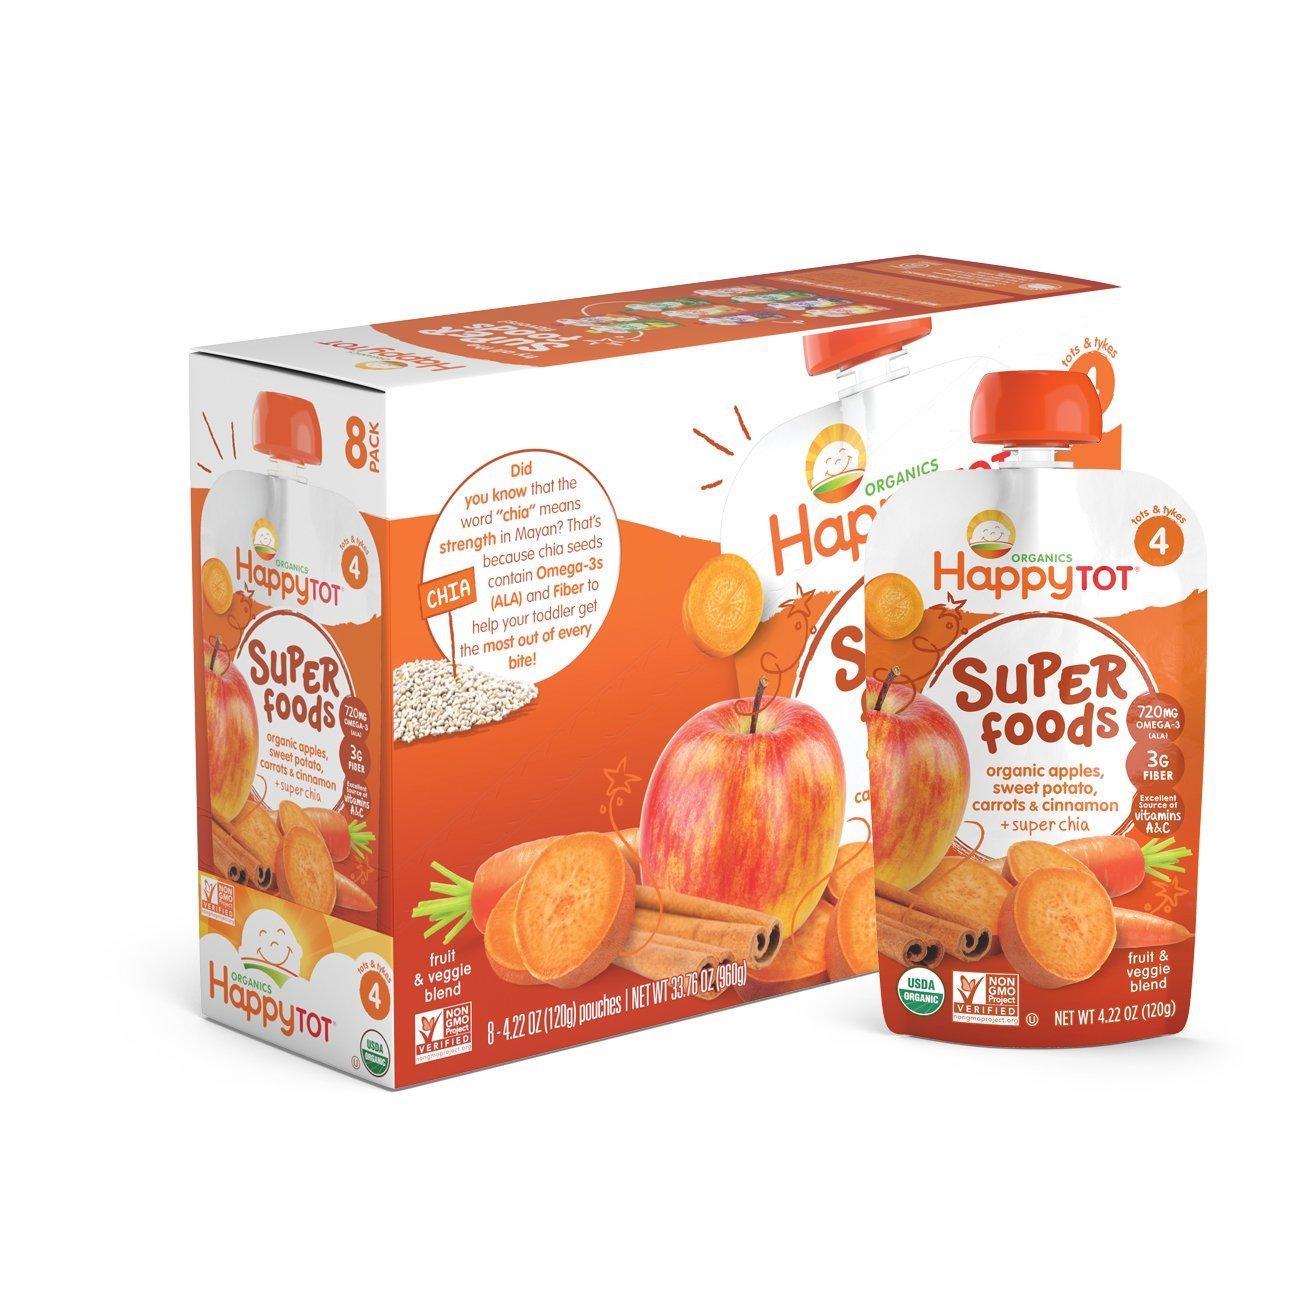 Amazon Happy Baby happy tot Sweet Potato, Apple, Carrots & Cinnamon,4.22 oz (Pack of 8) $3.41 (Add-On)